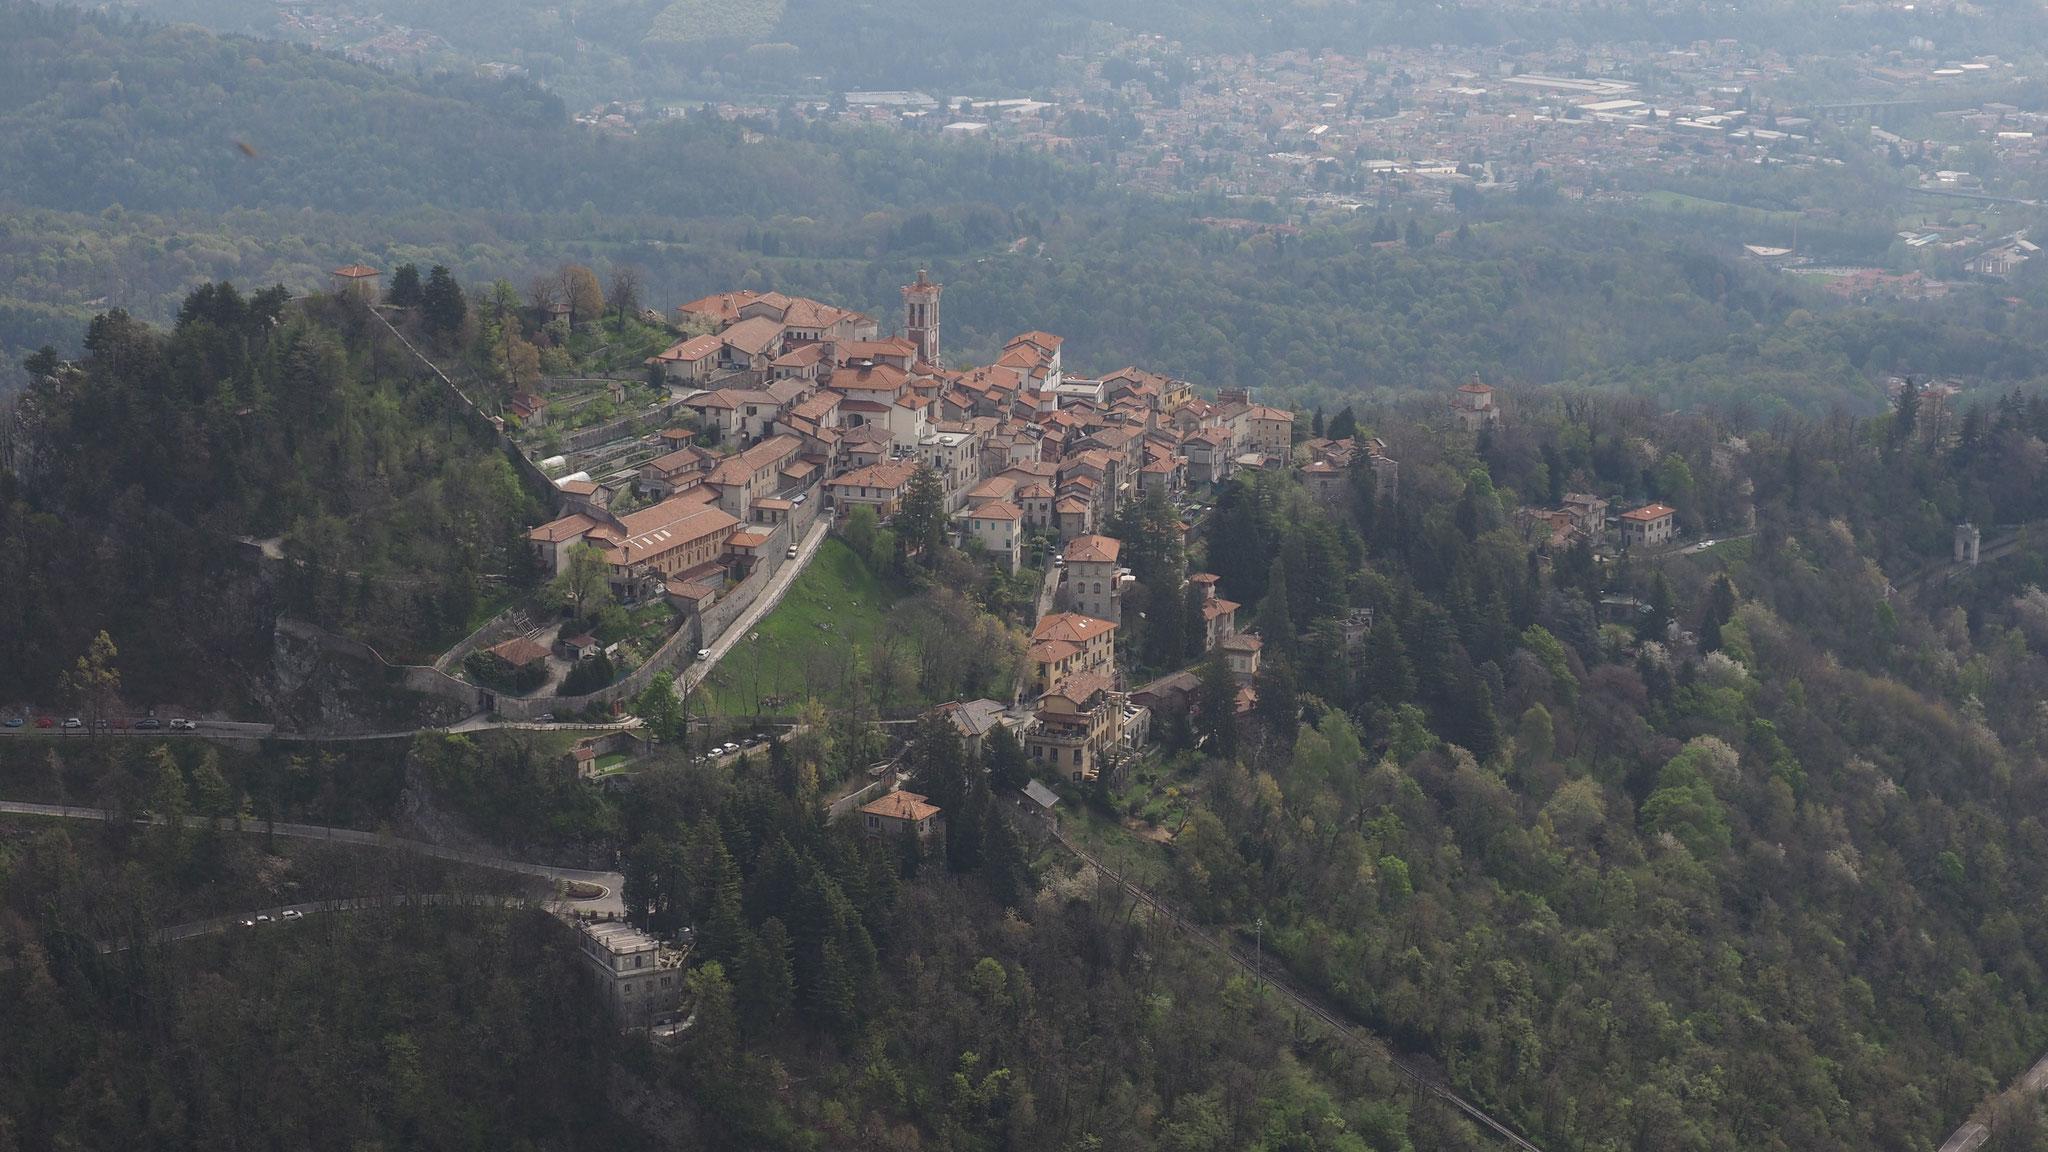 Blick auf Sacro Monte